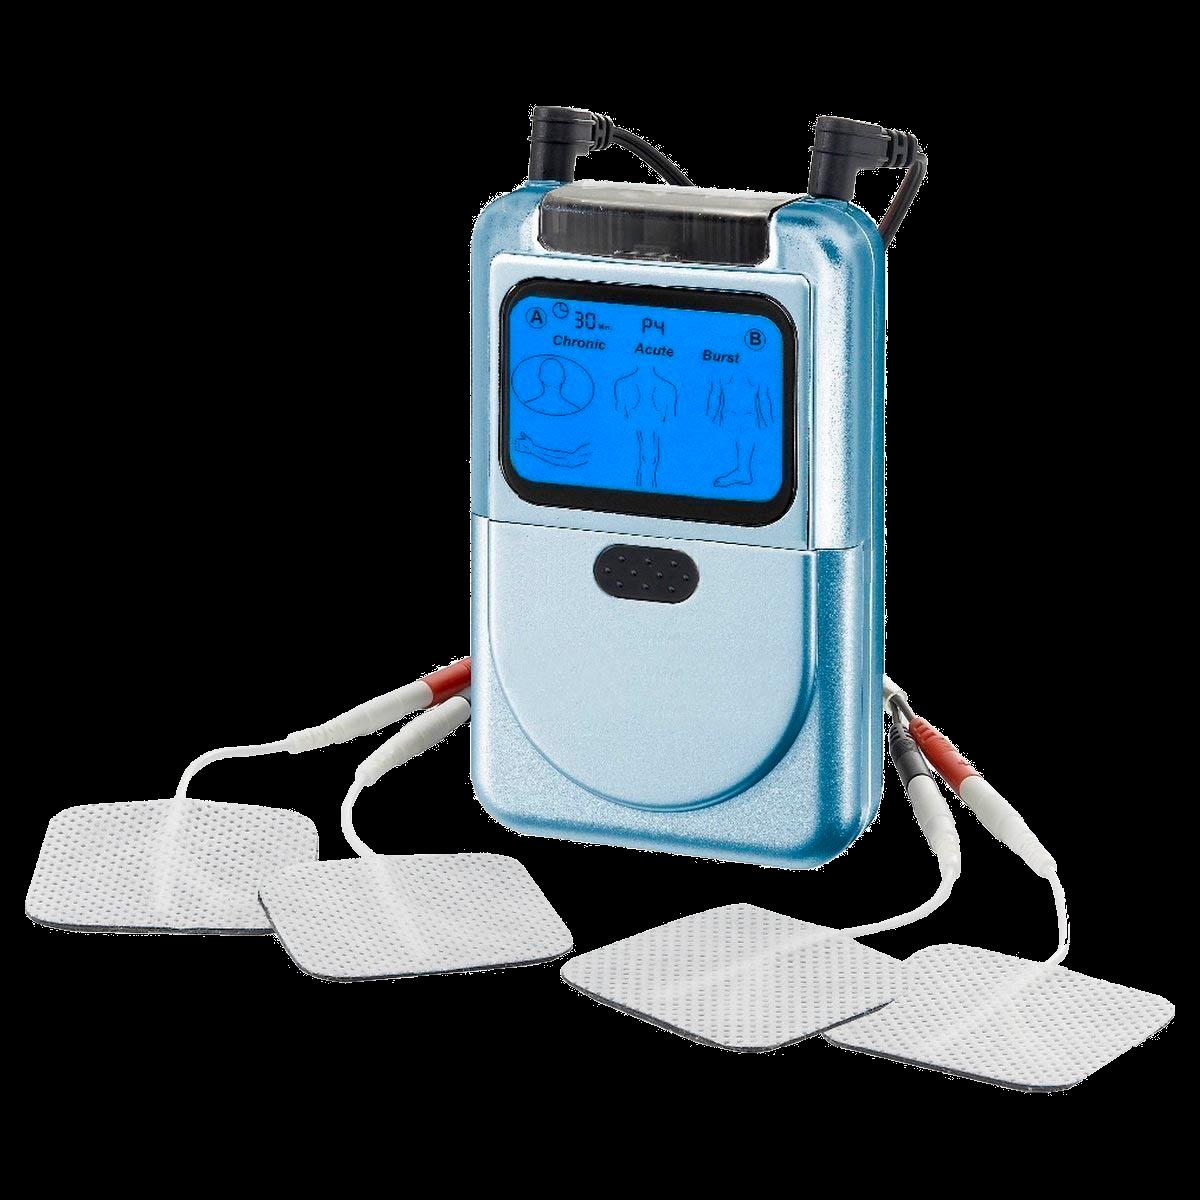 Professional electrostimulators